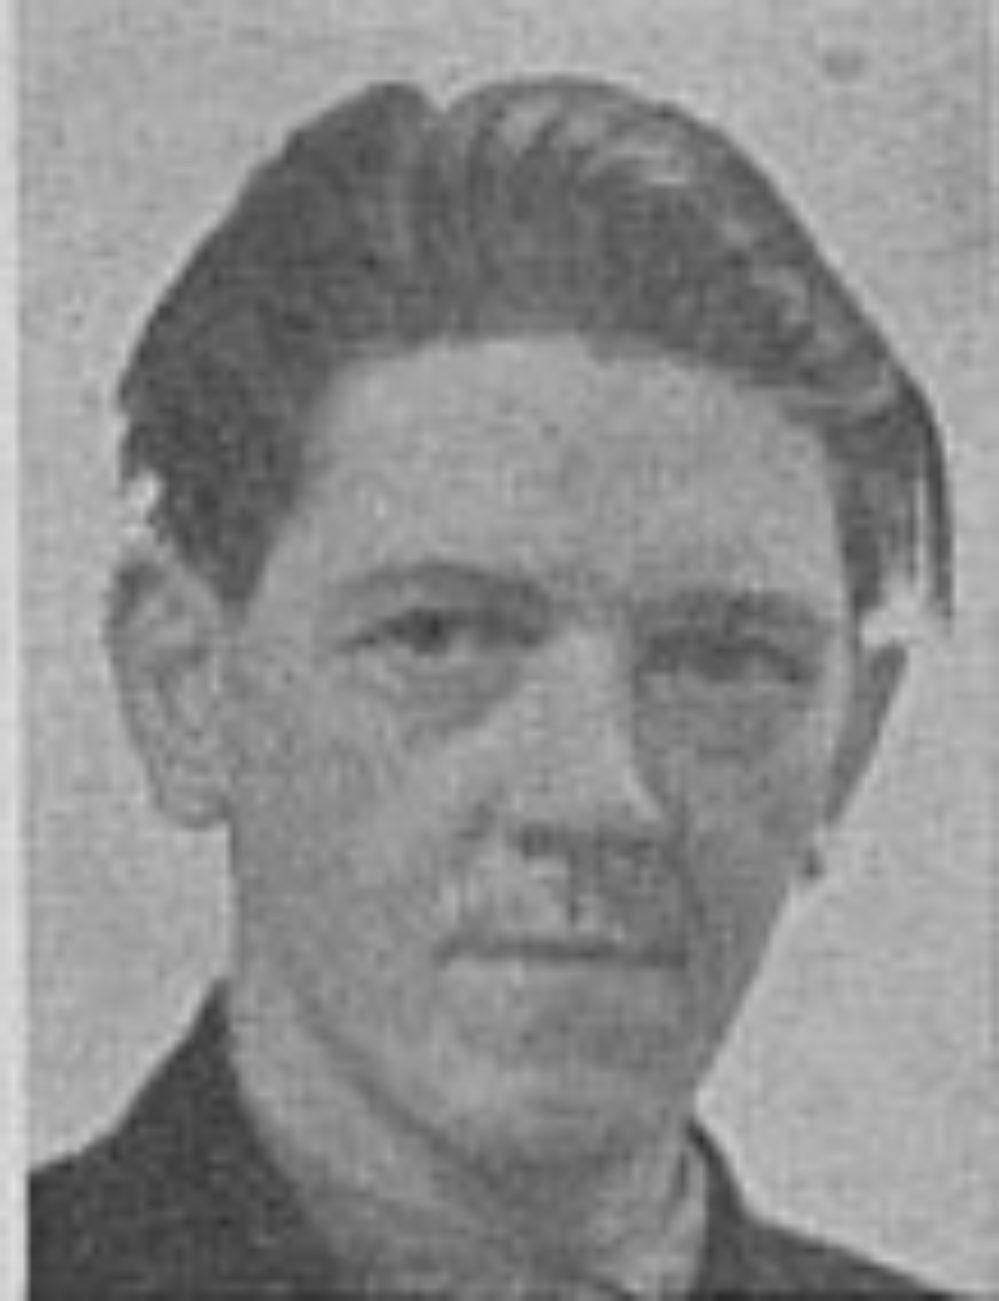 Aleks Ingvald Bohnhorst